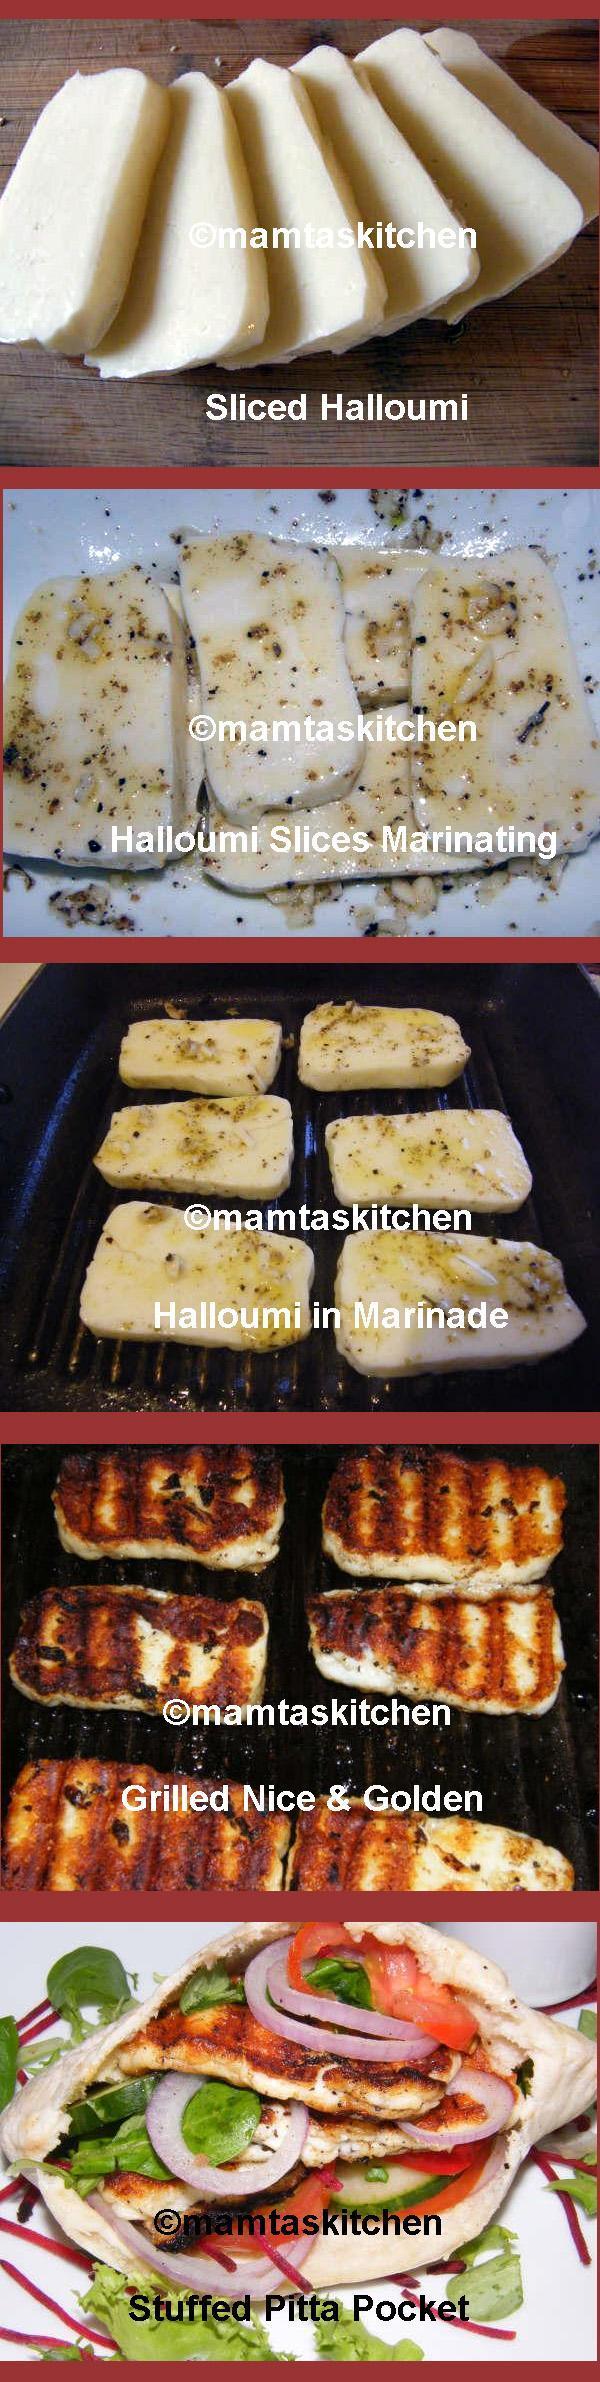 Halloumi Kebab Sandwich